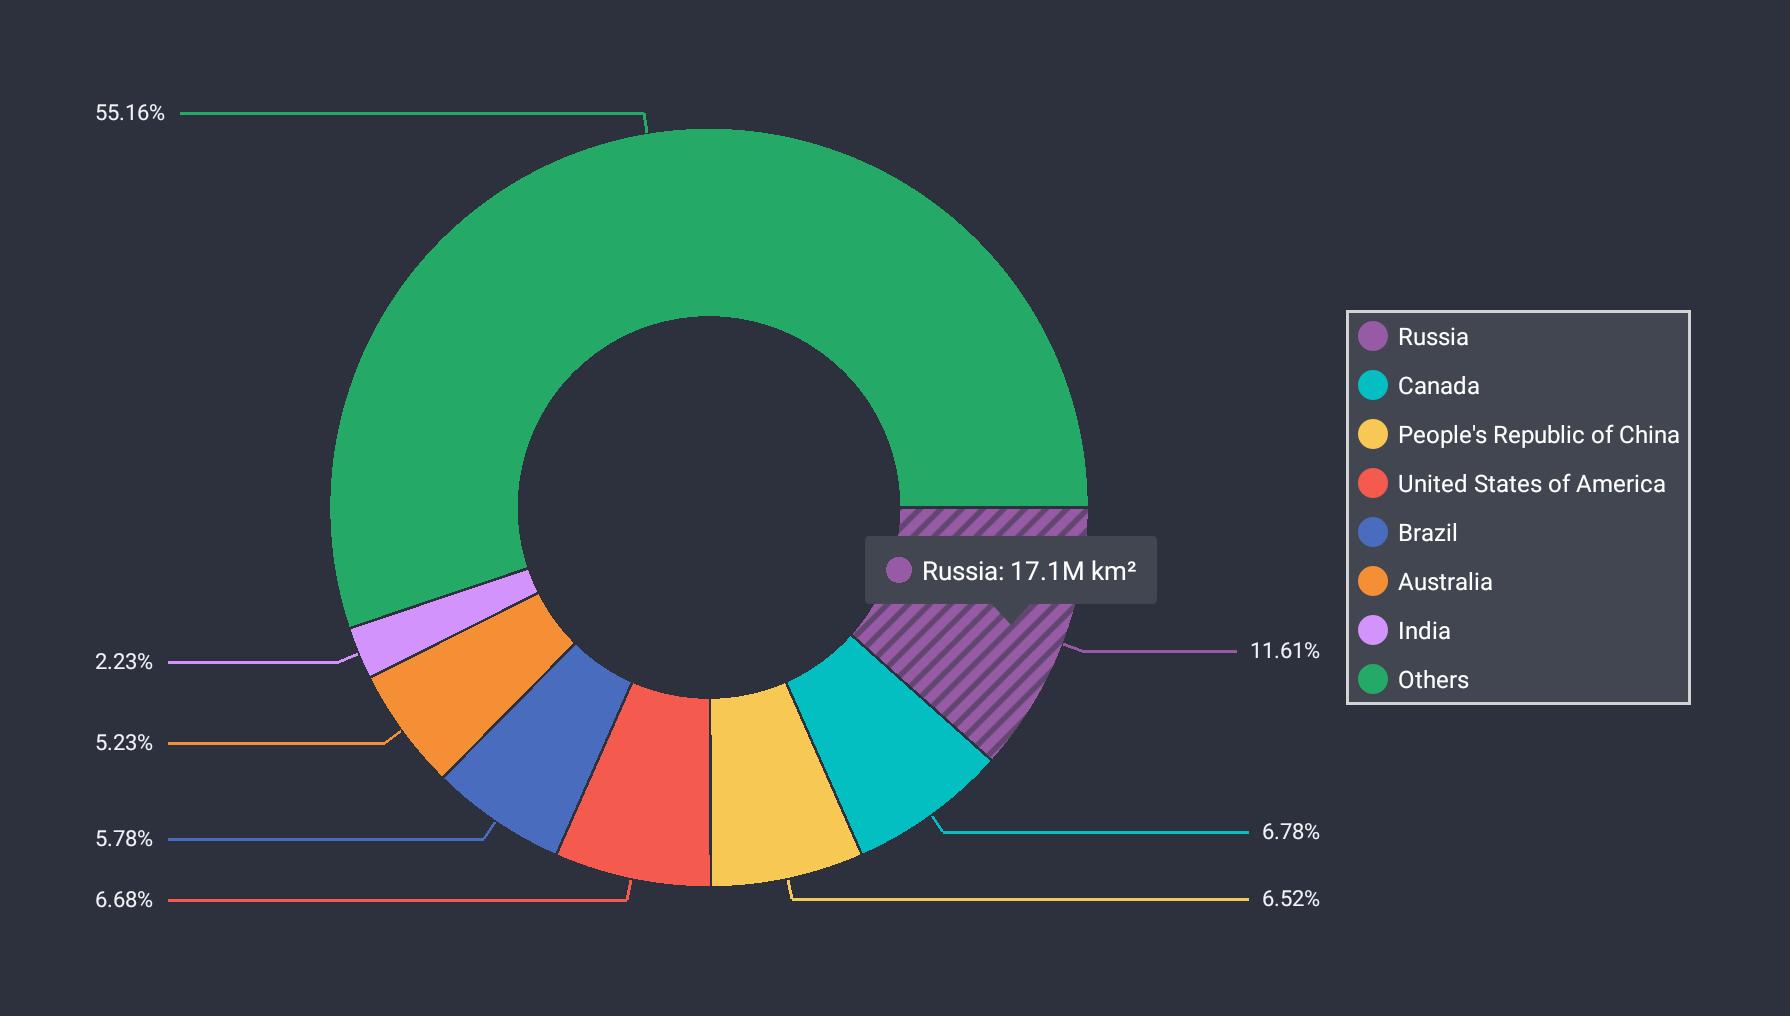 Lesson 1: Create a Pie Chart | Mobile UI Controls ...